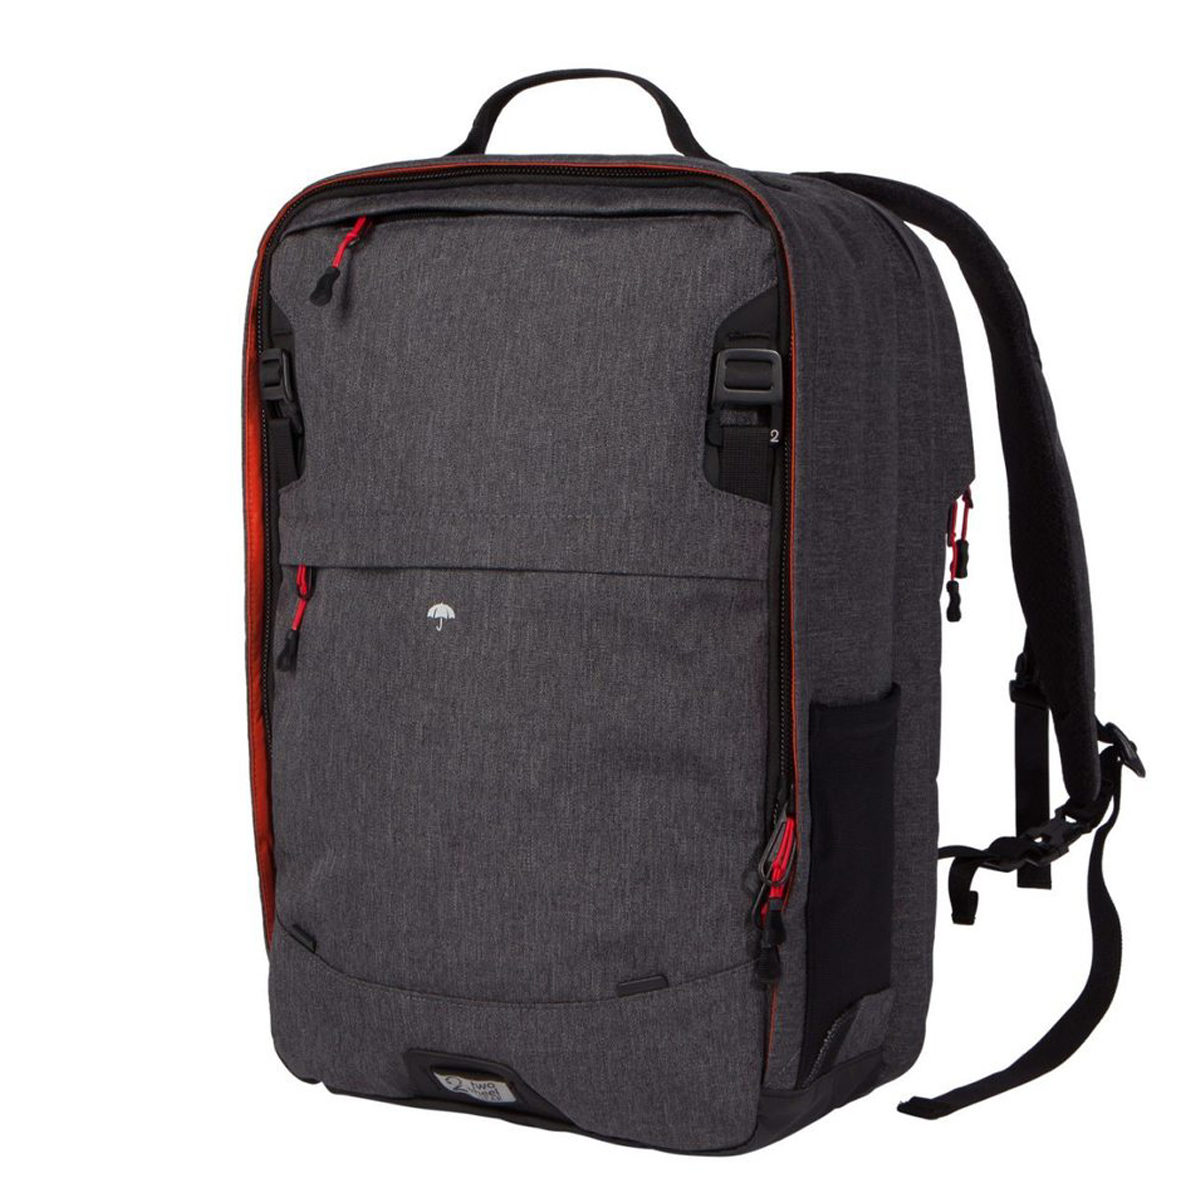 Pannier Backpack Convertible – Plus 9